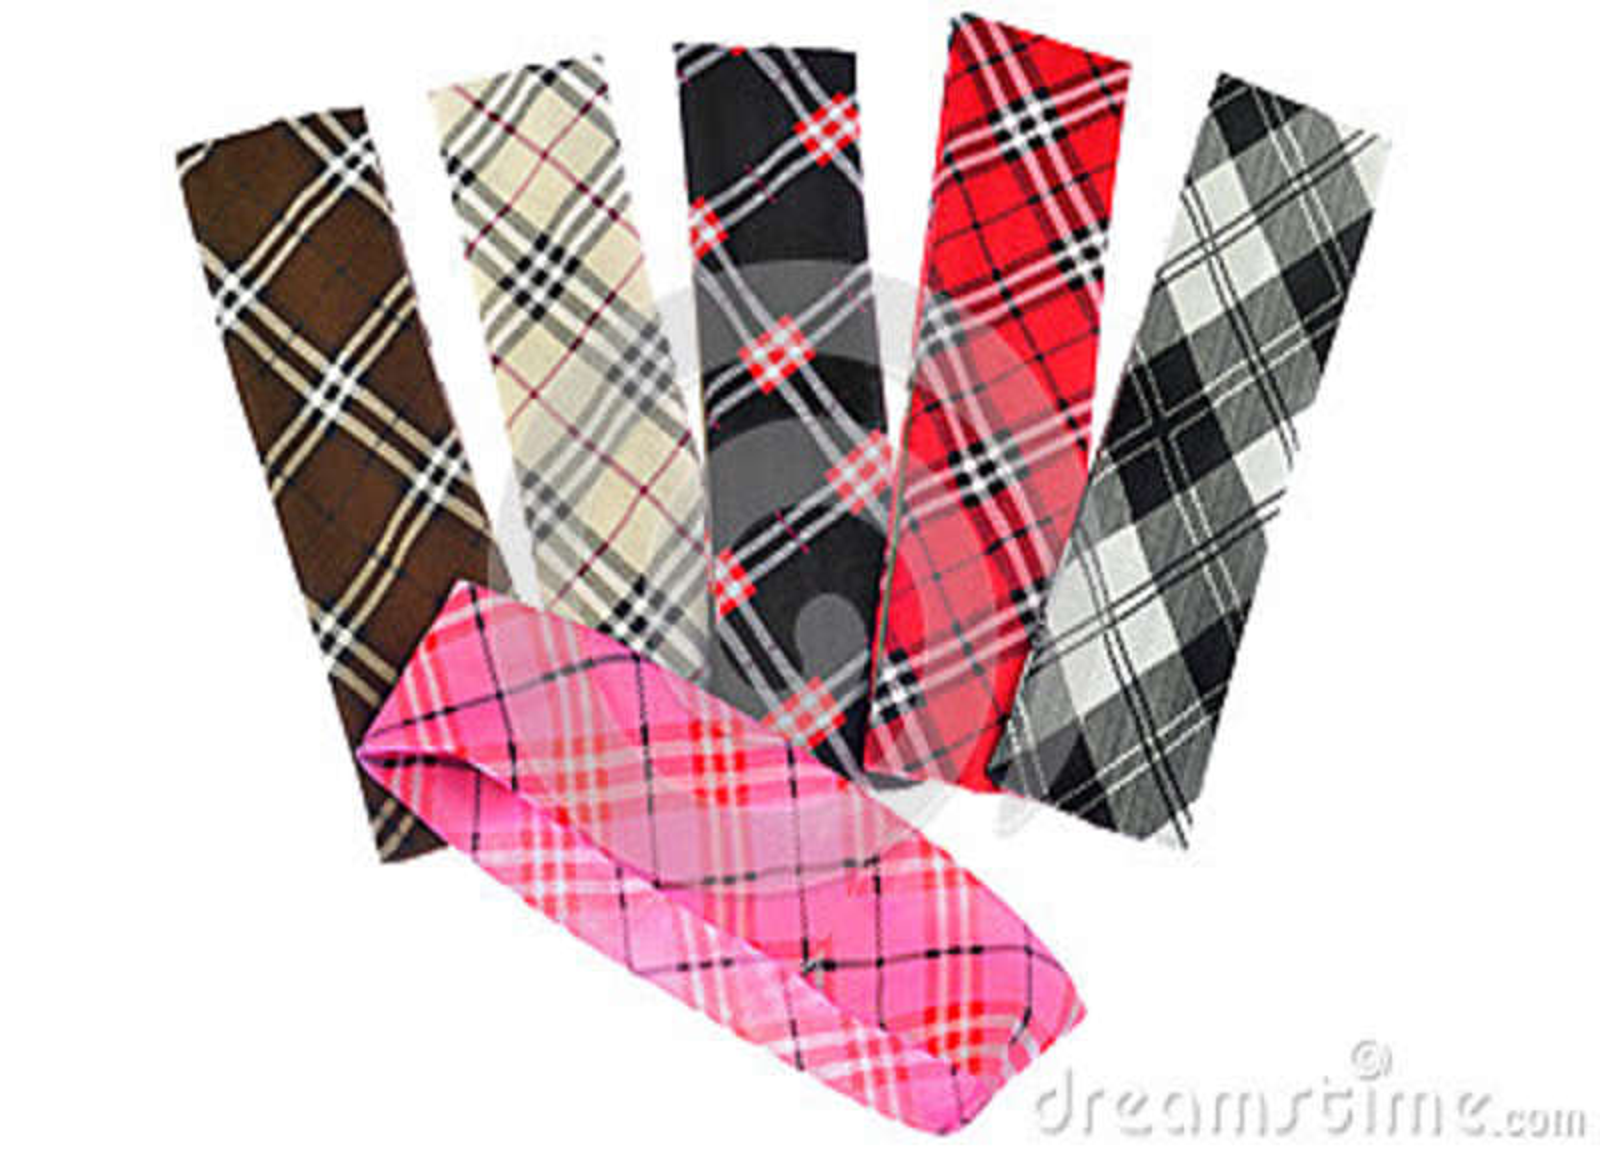 d43792153cb69 Lumberjack Plaid And Buffalo Check Patterns. Red